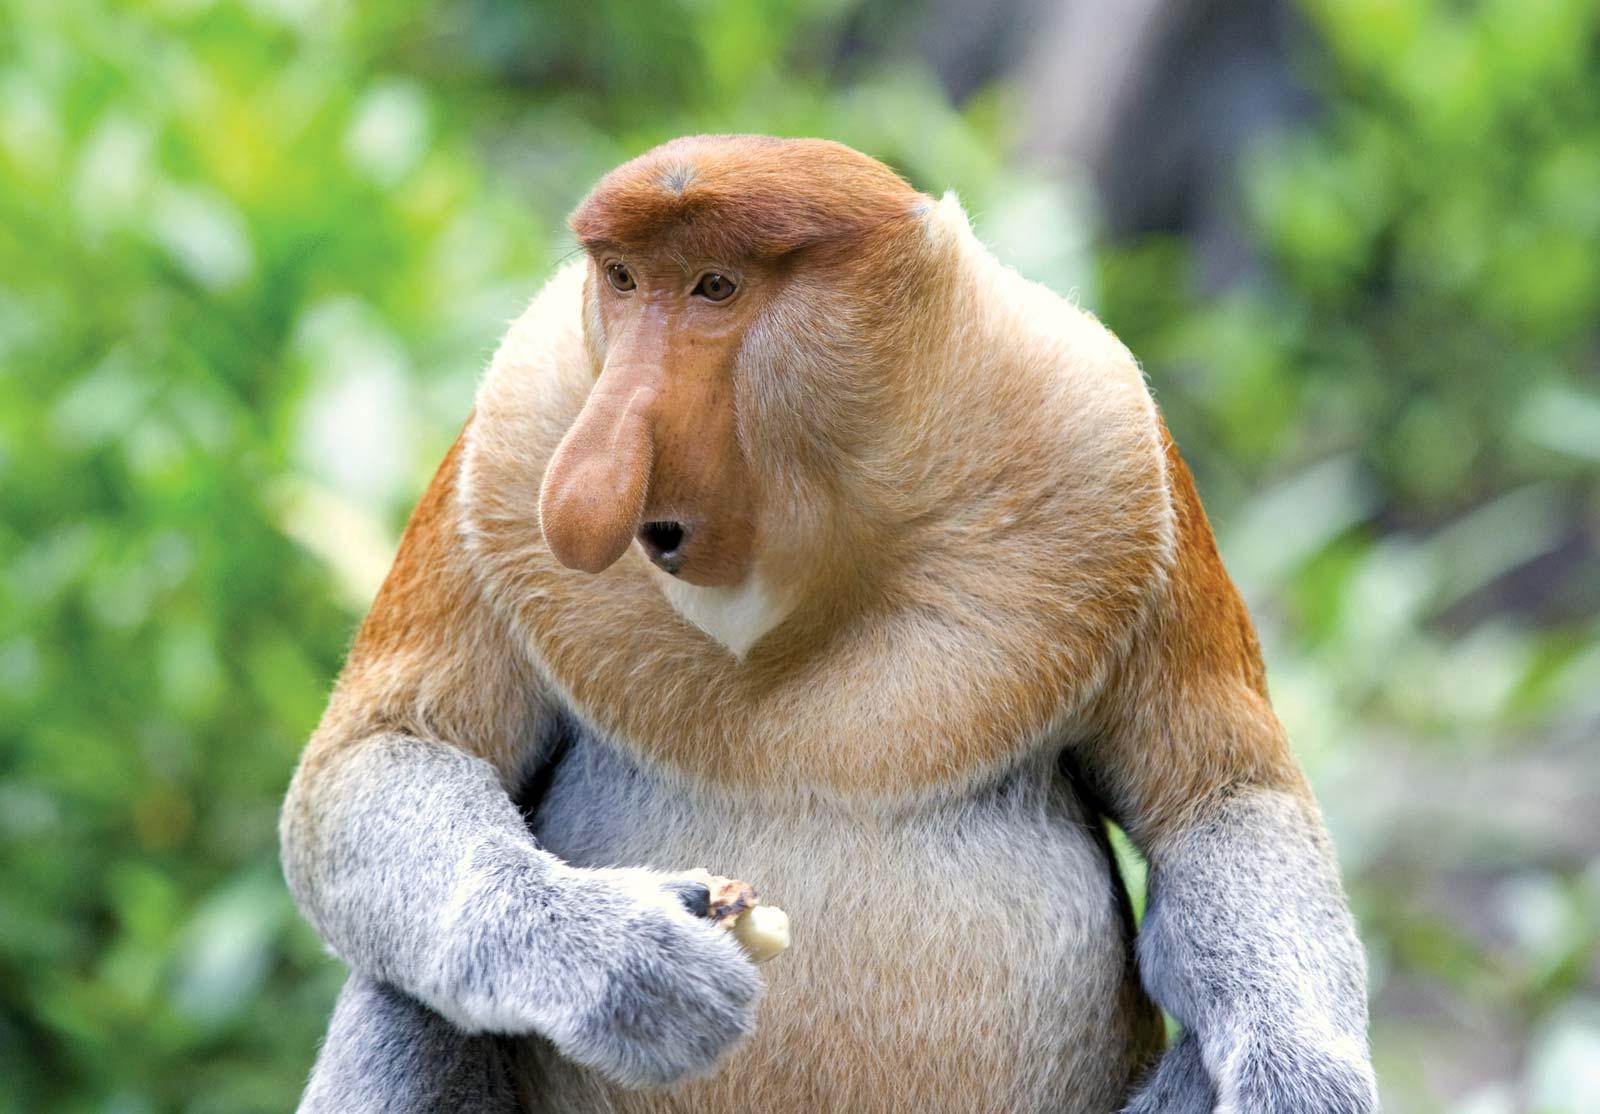 Proboscis-monkey.jpg